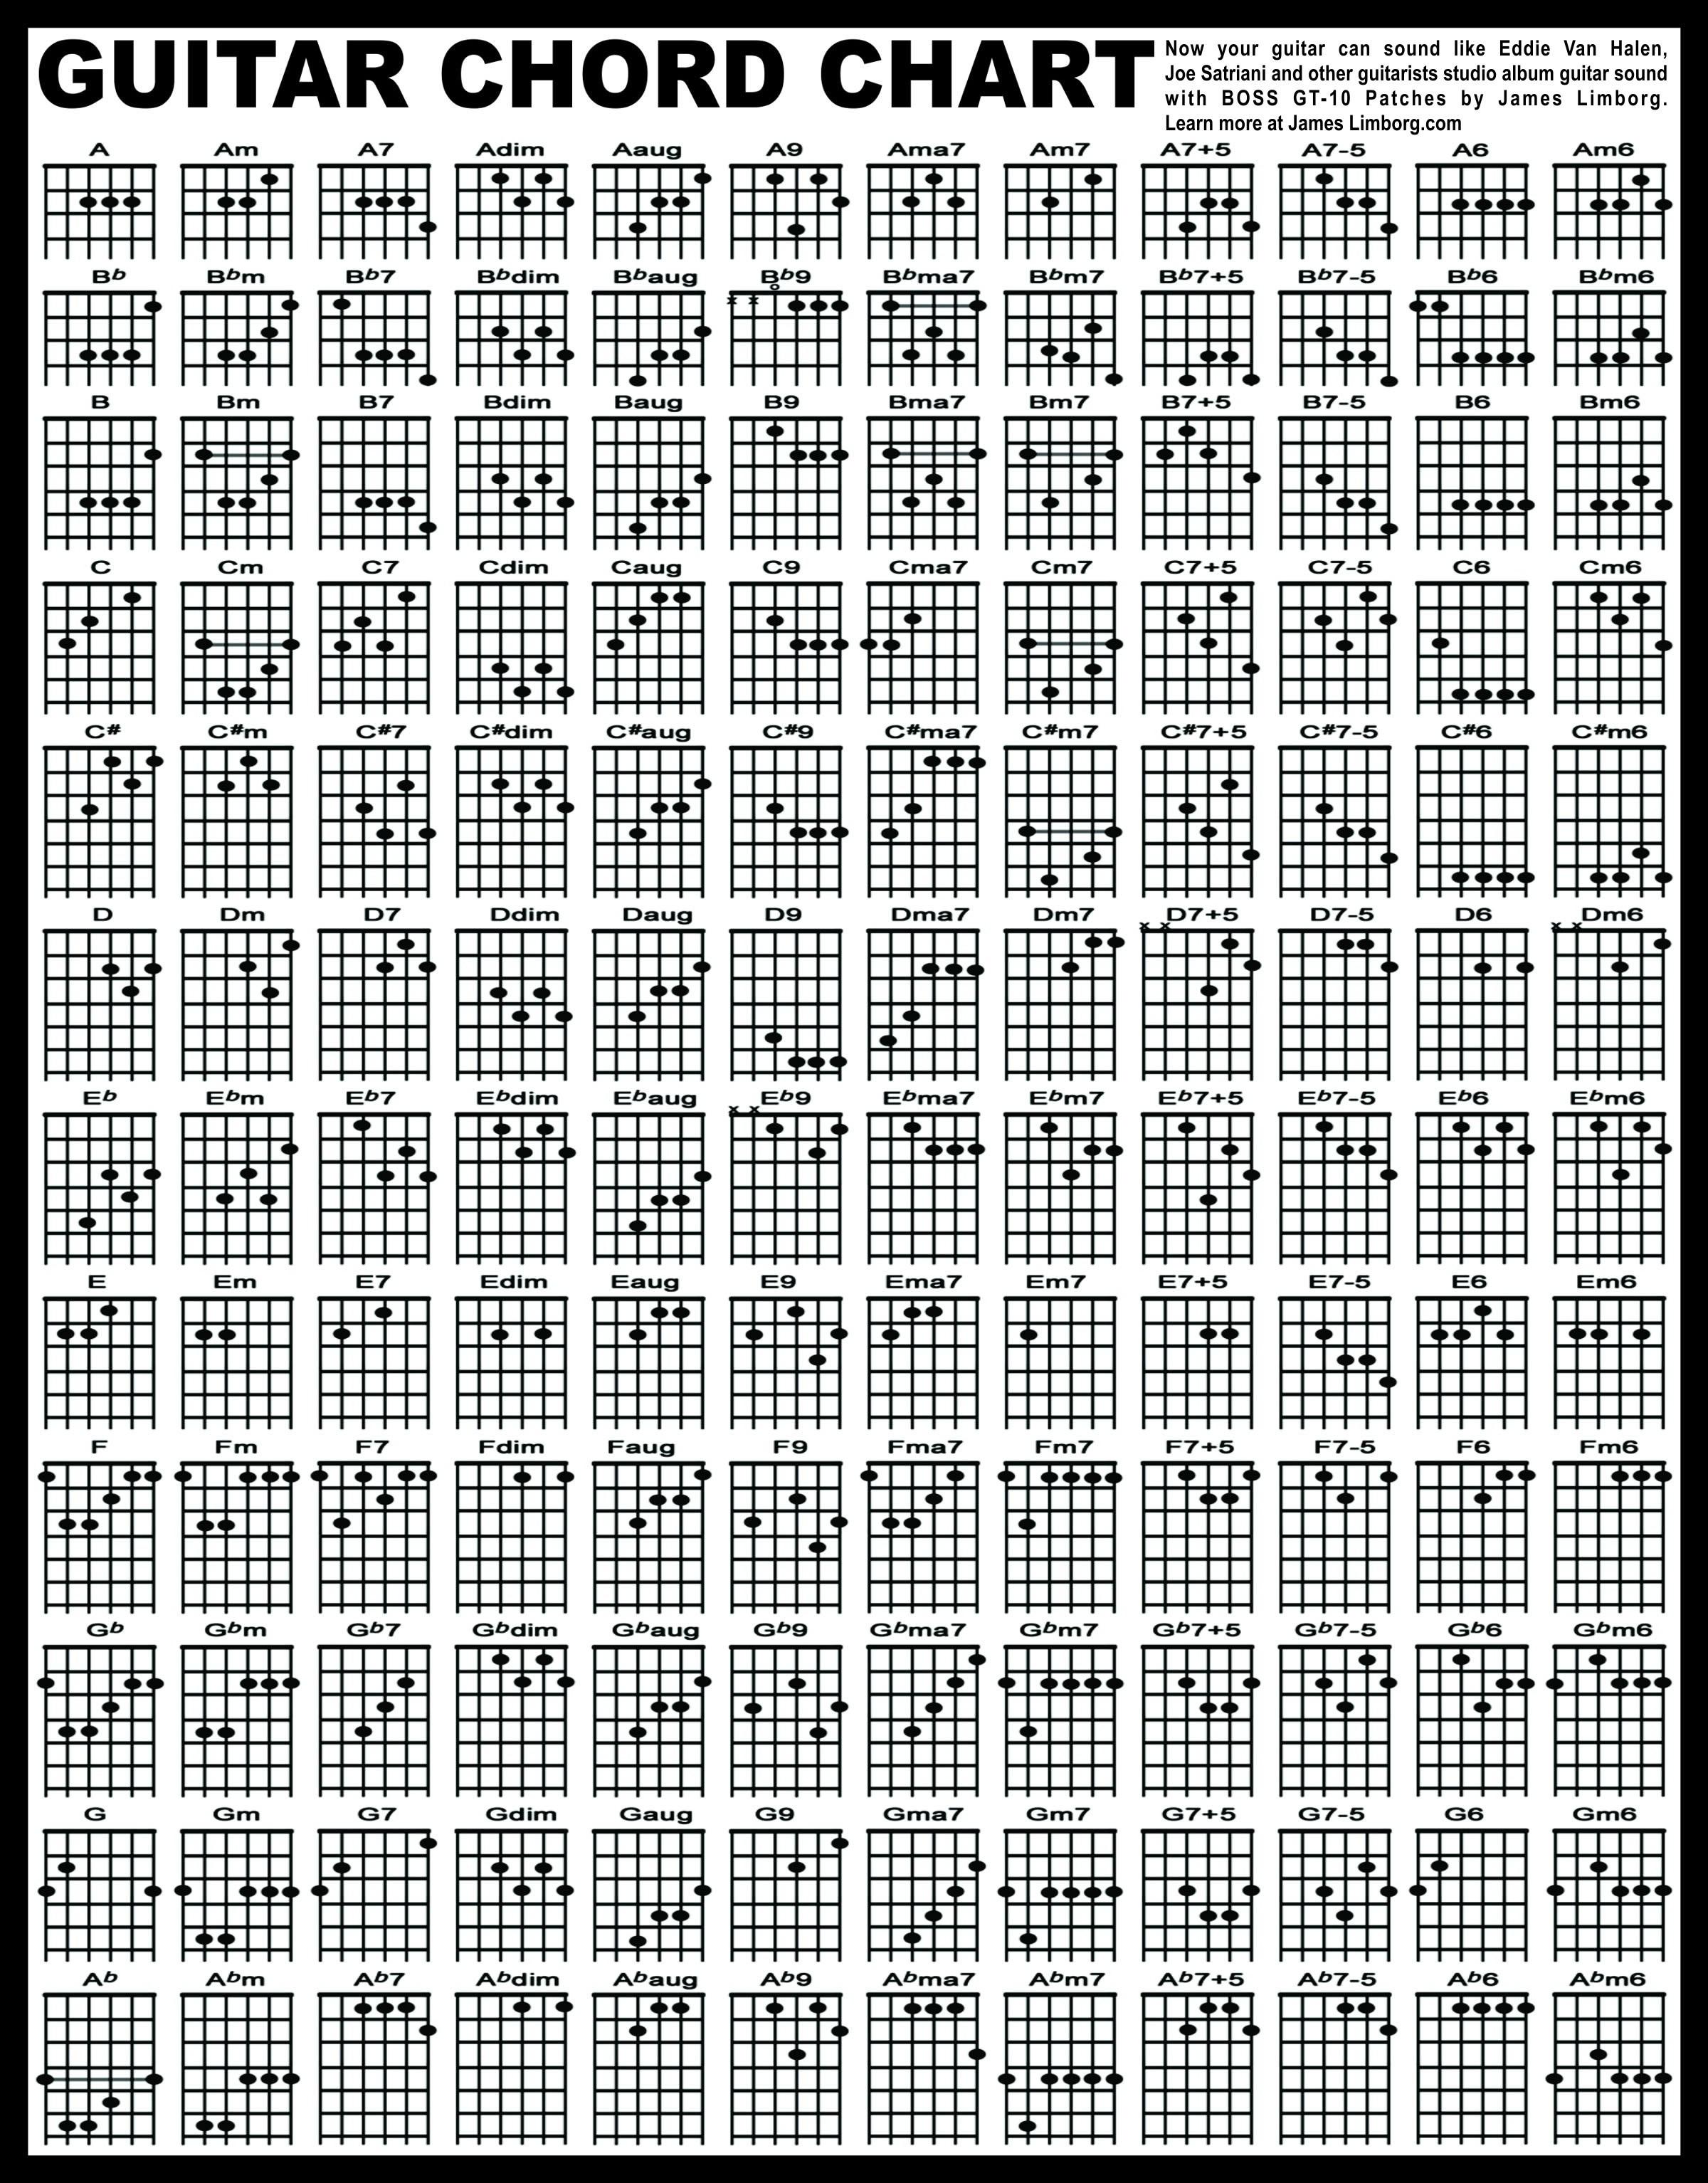 Guitar Chords Chart Guitar Bar Chords Chart Pdf Yederberglauf Verband